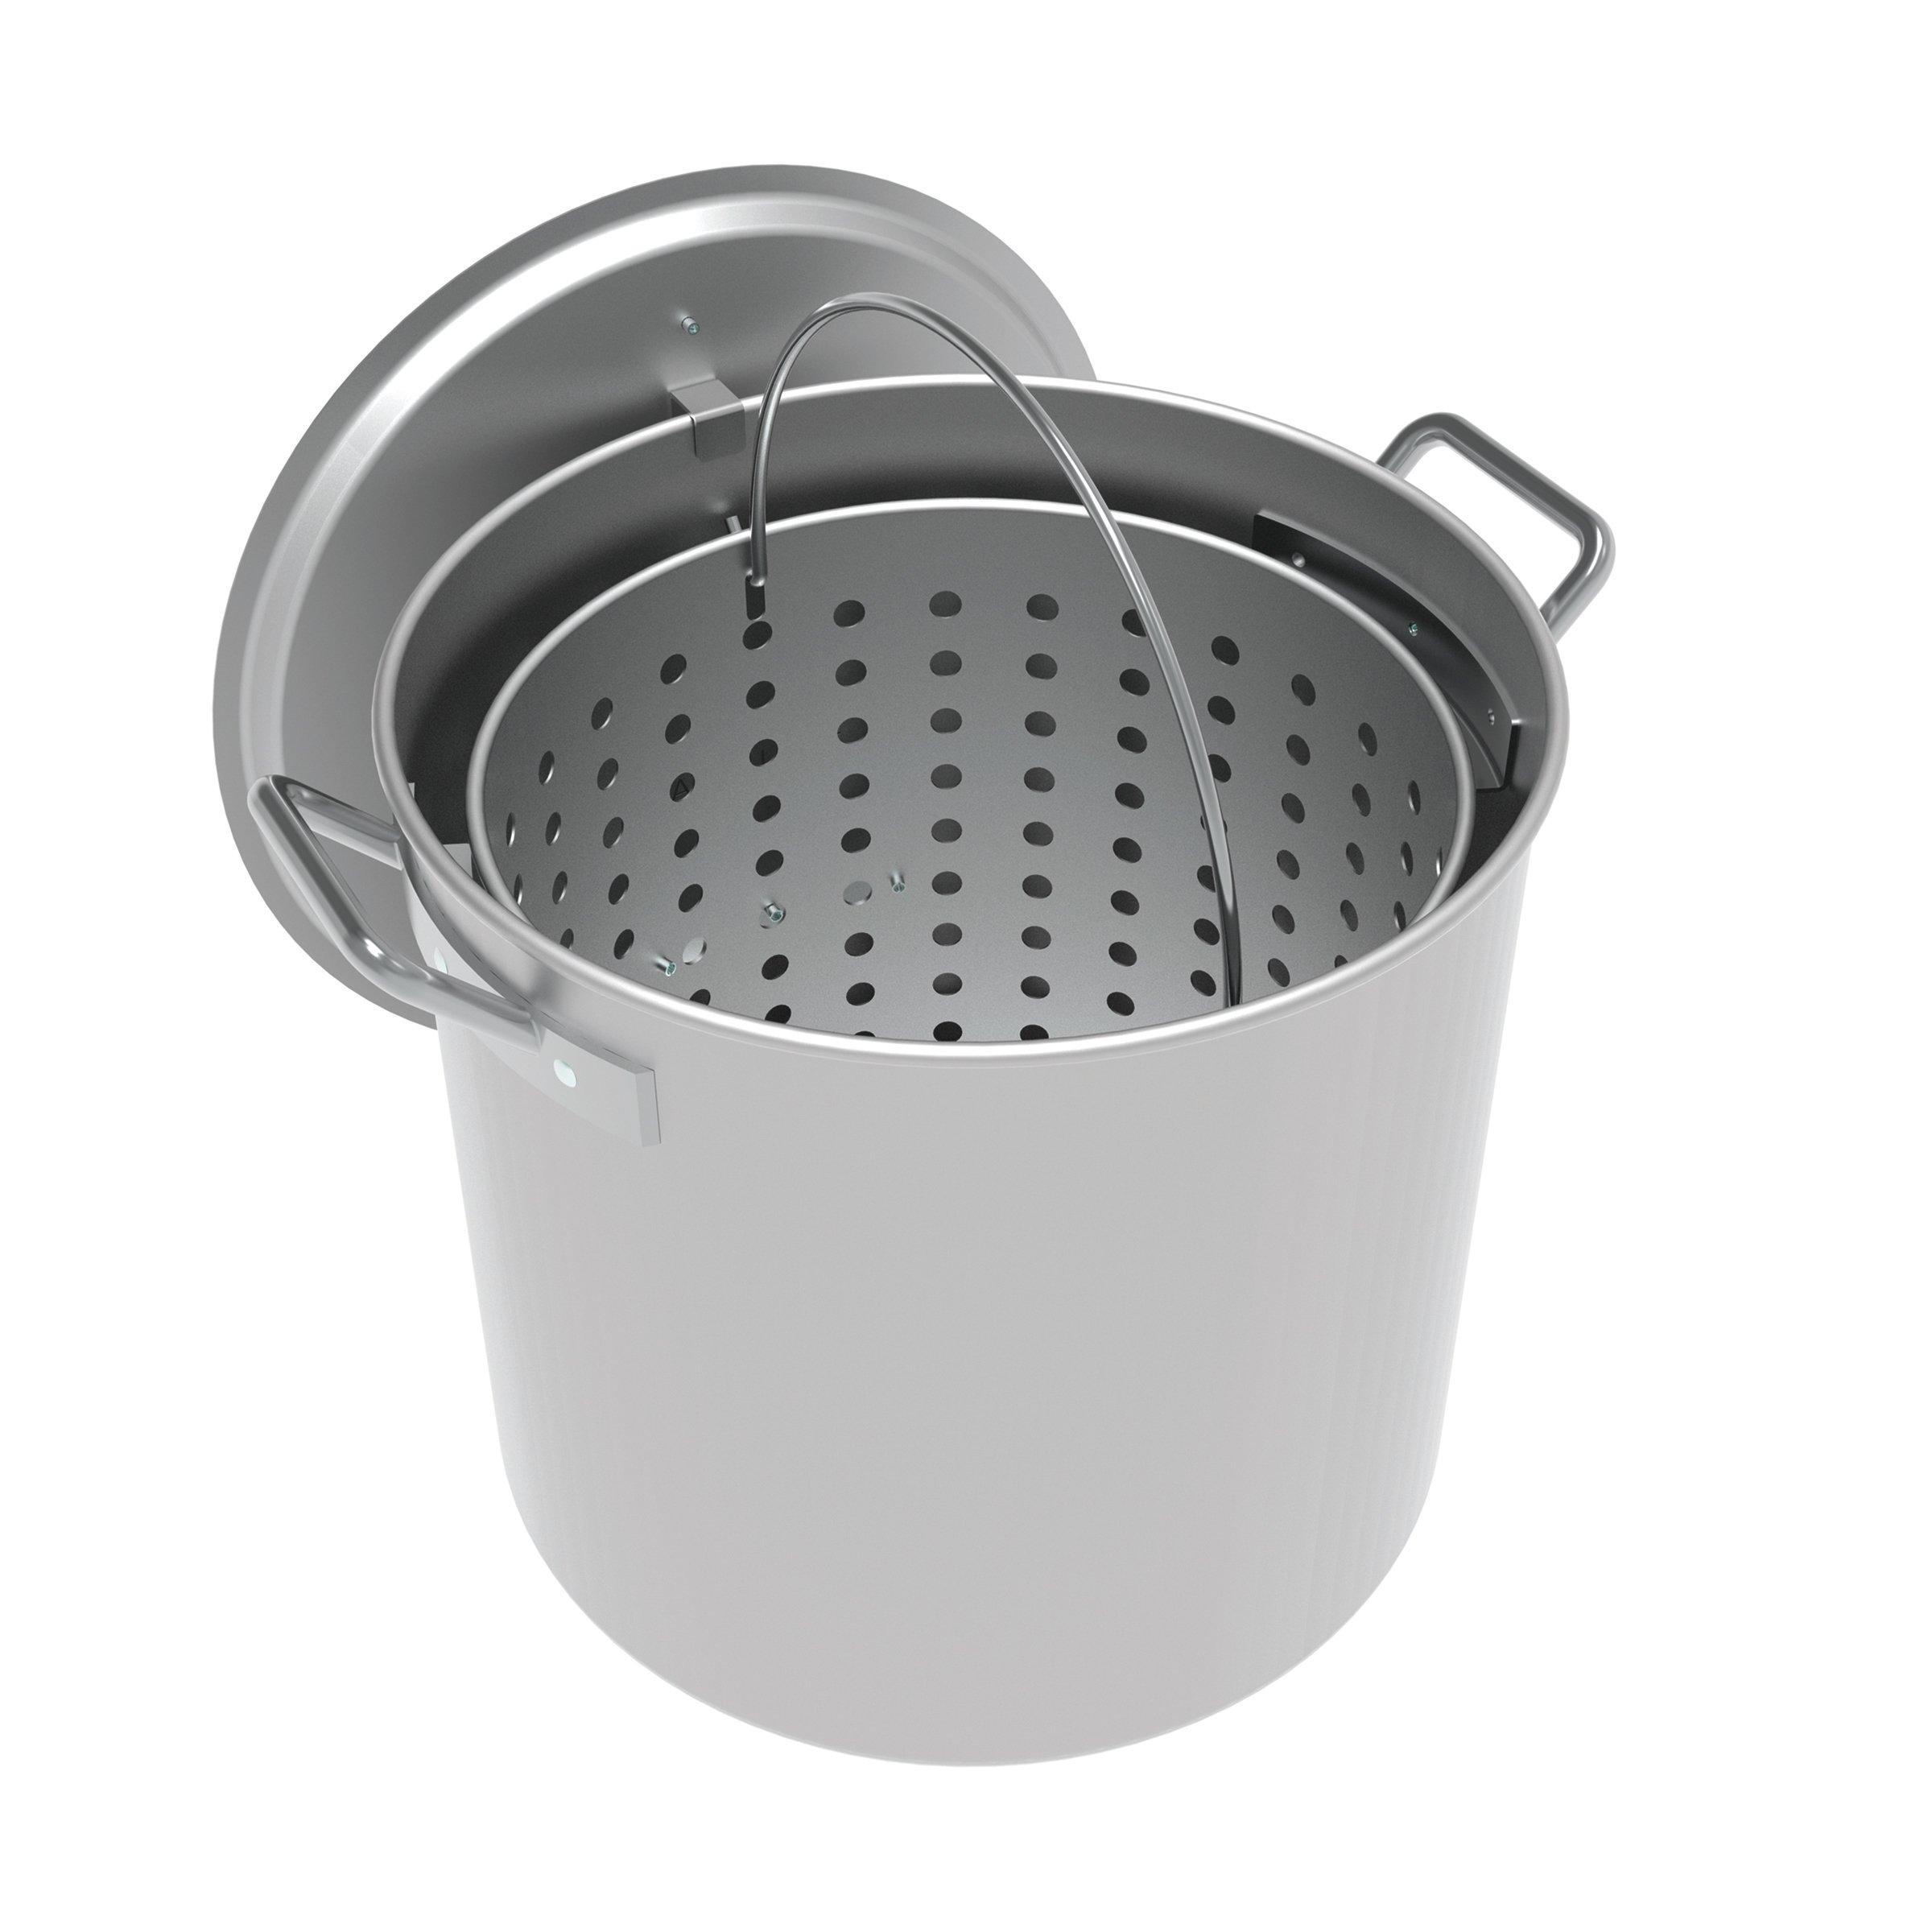 LoCo Cookers LCPT60 Aluminum Boiling Pot, 60 Quart, Silver